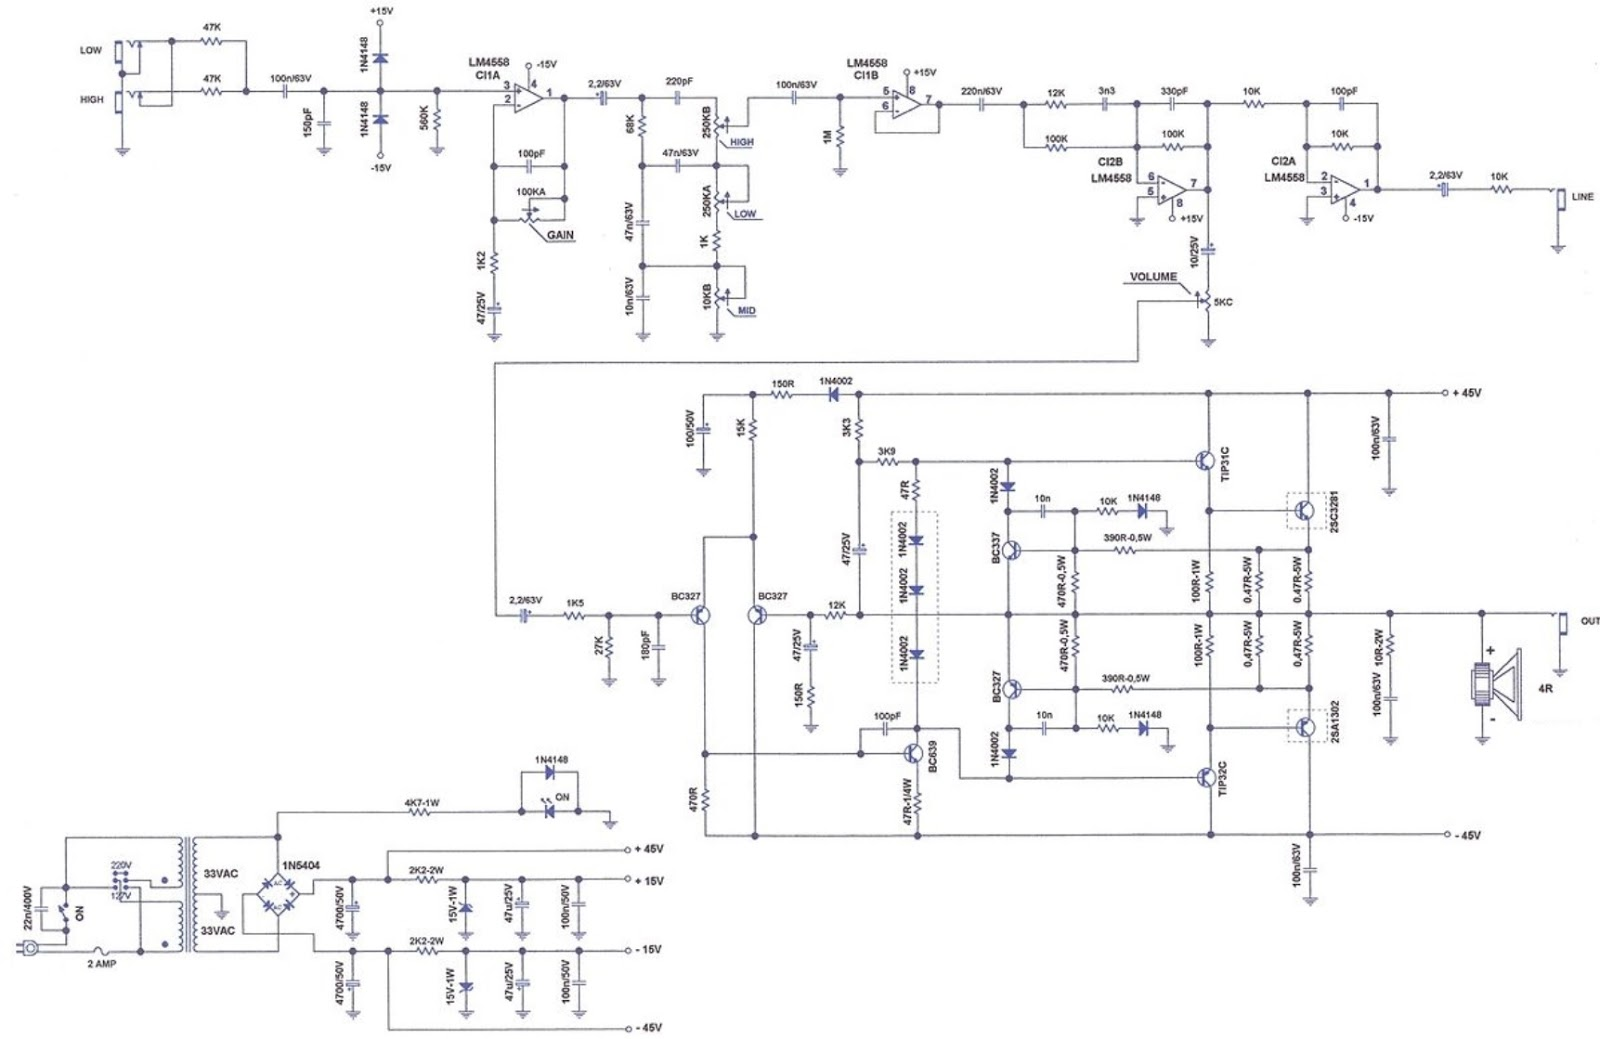 Berühmt Ef Falcon Schaltplan Fotos - Schaltplan Serie Circuit ...